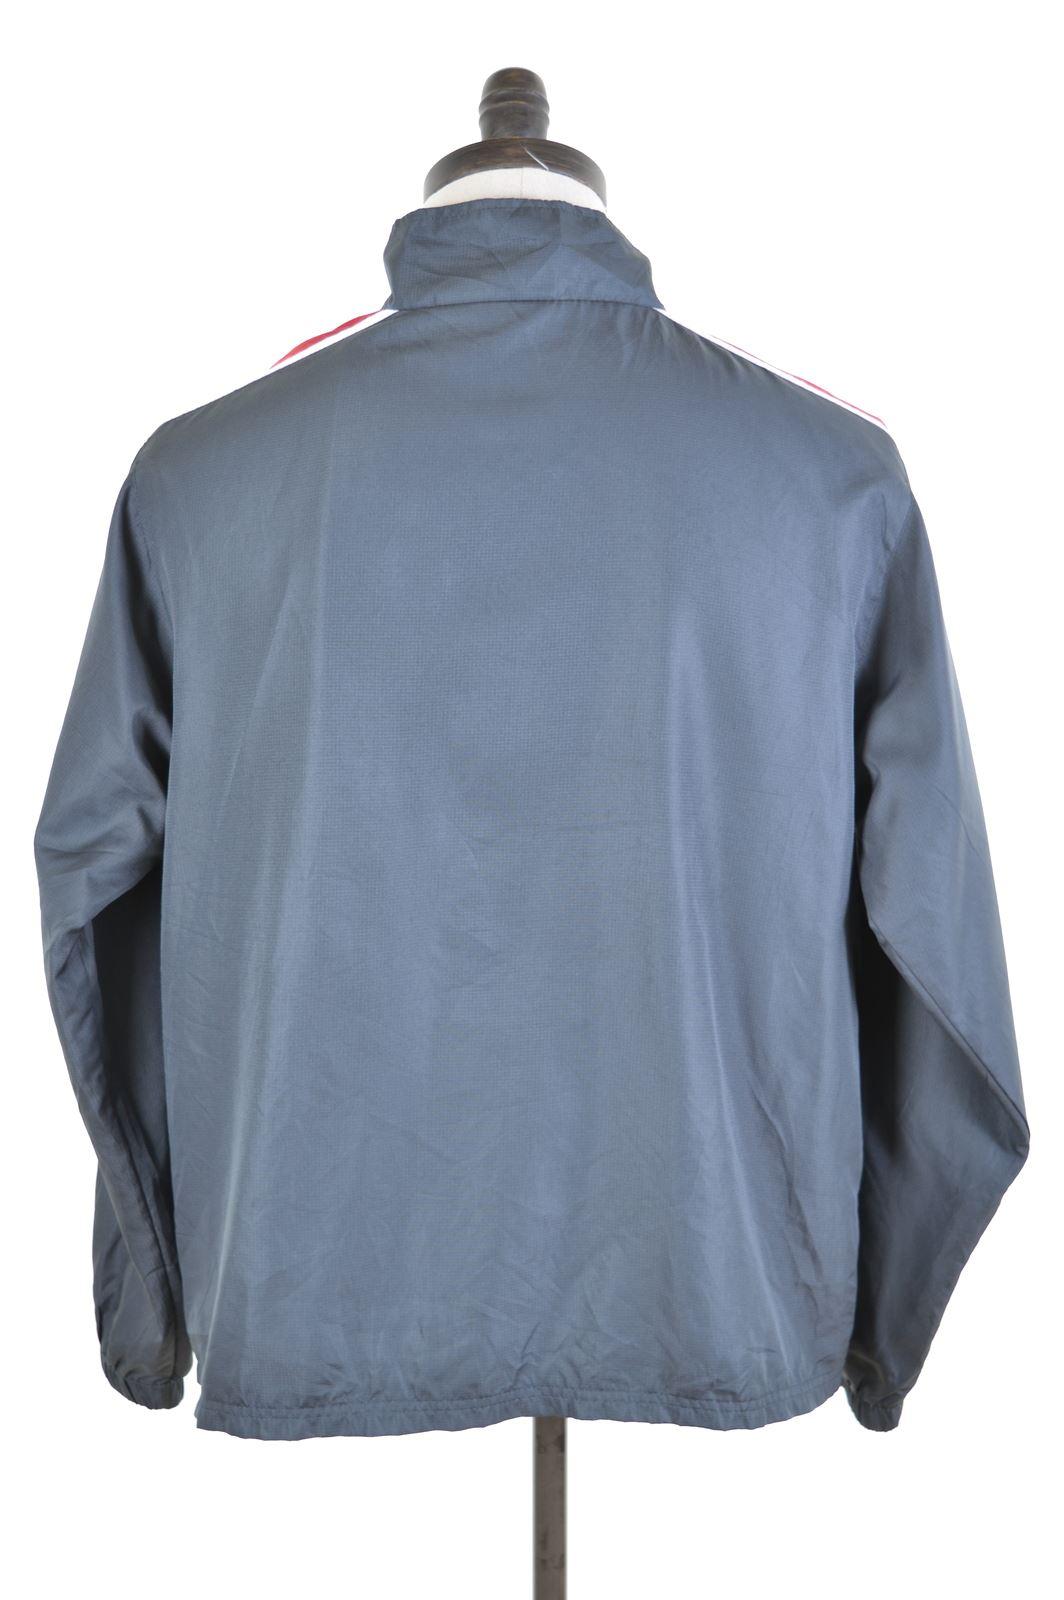 STARTER Mens Tracksuit Top Jacket Large Grey Polyester  56457dfdf3